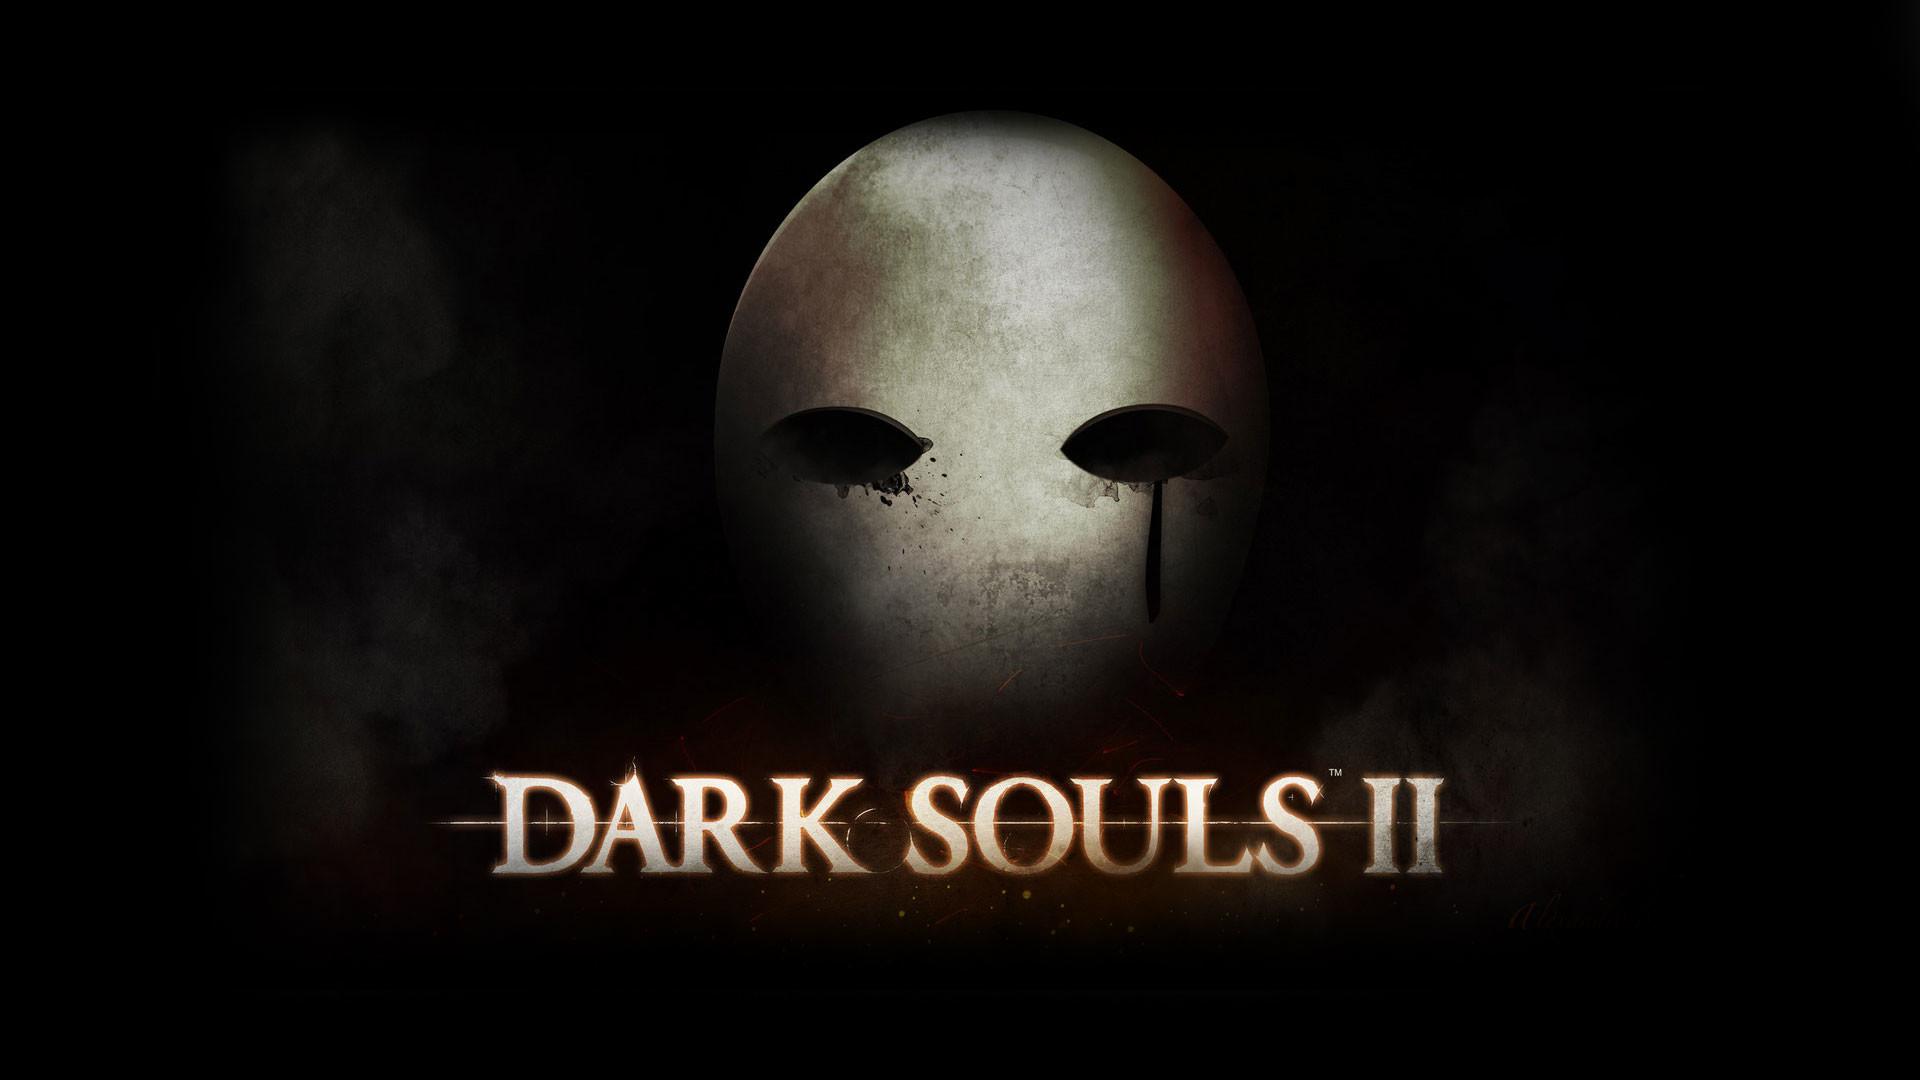 … Dark Souls II Wallpaper 5 …